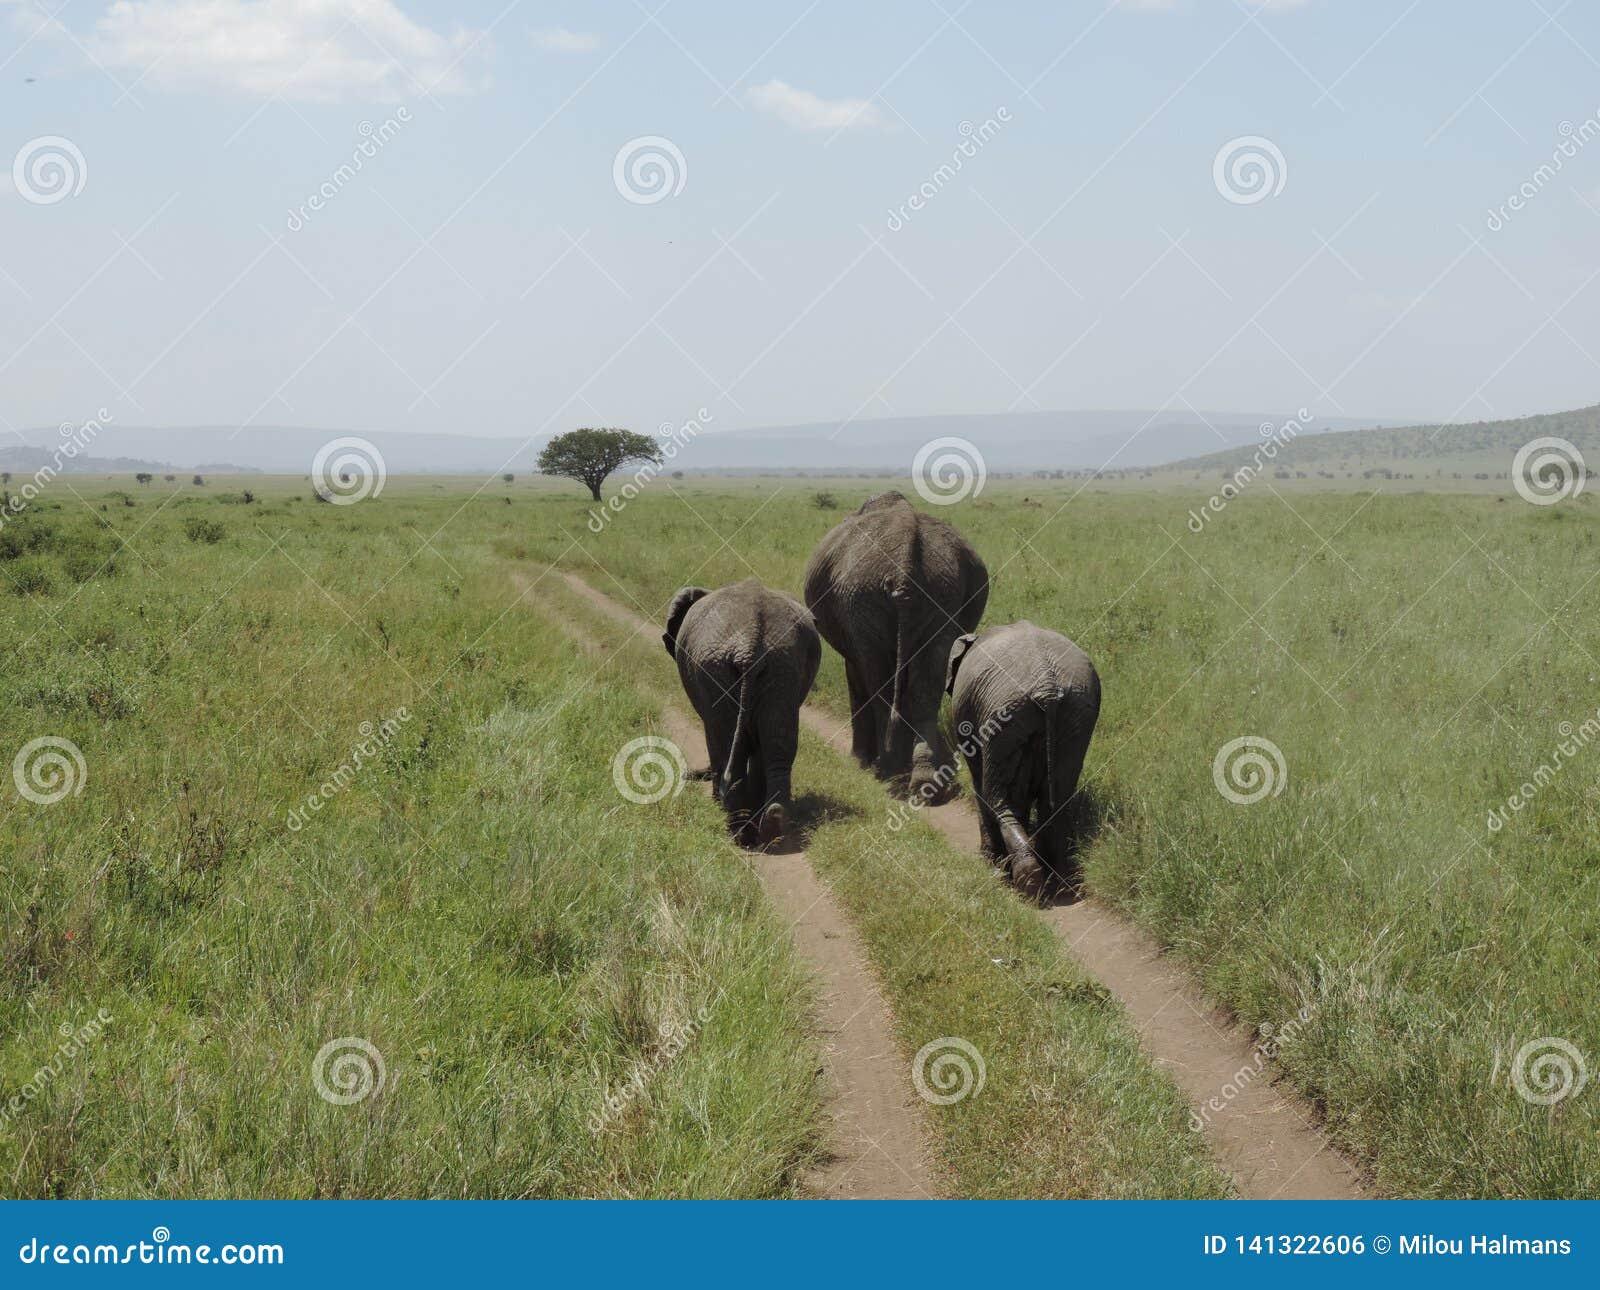 Afrikanischer Mutterelefant mit Babyelefanten in Nationalpark Serengeti, Tansania